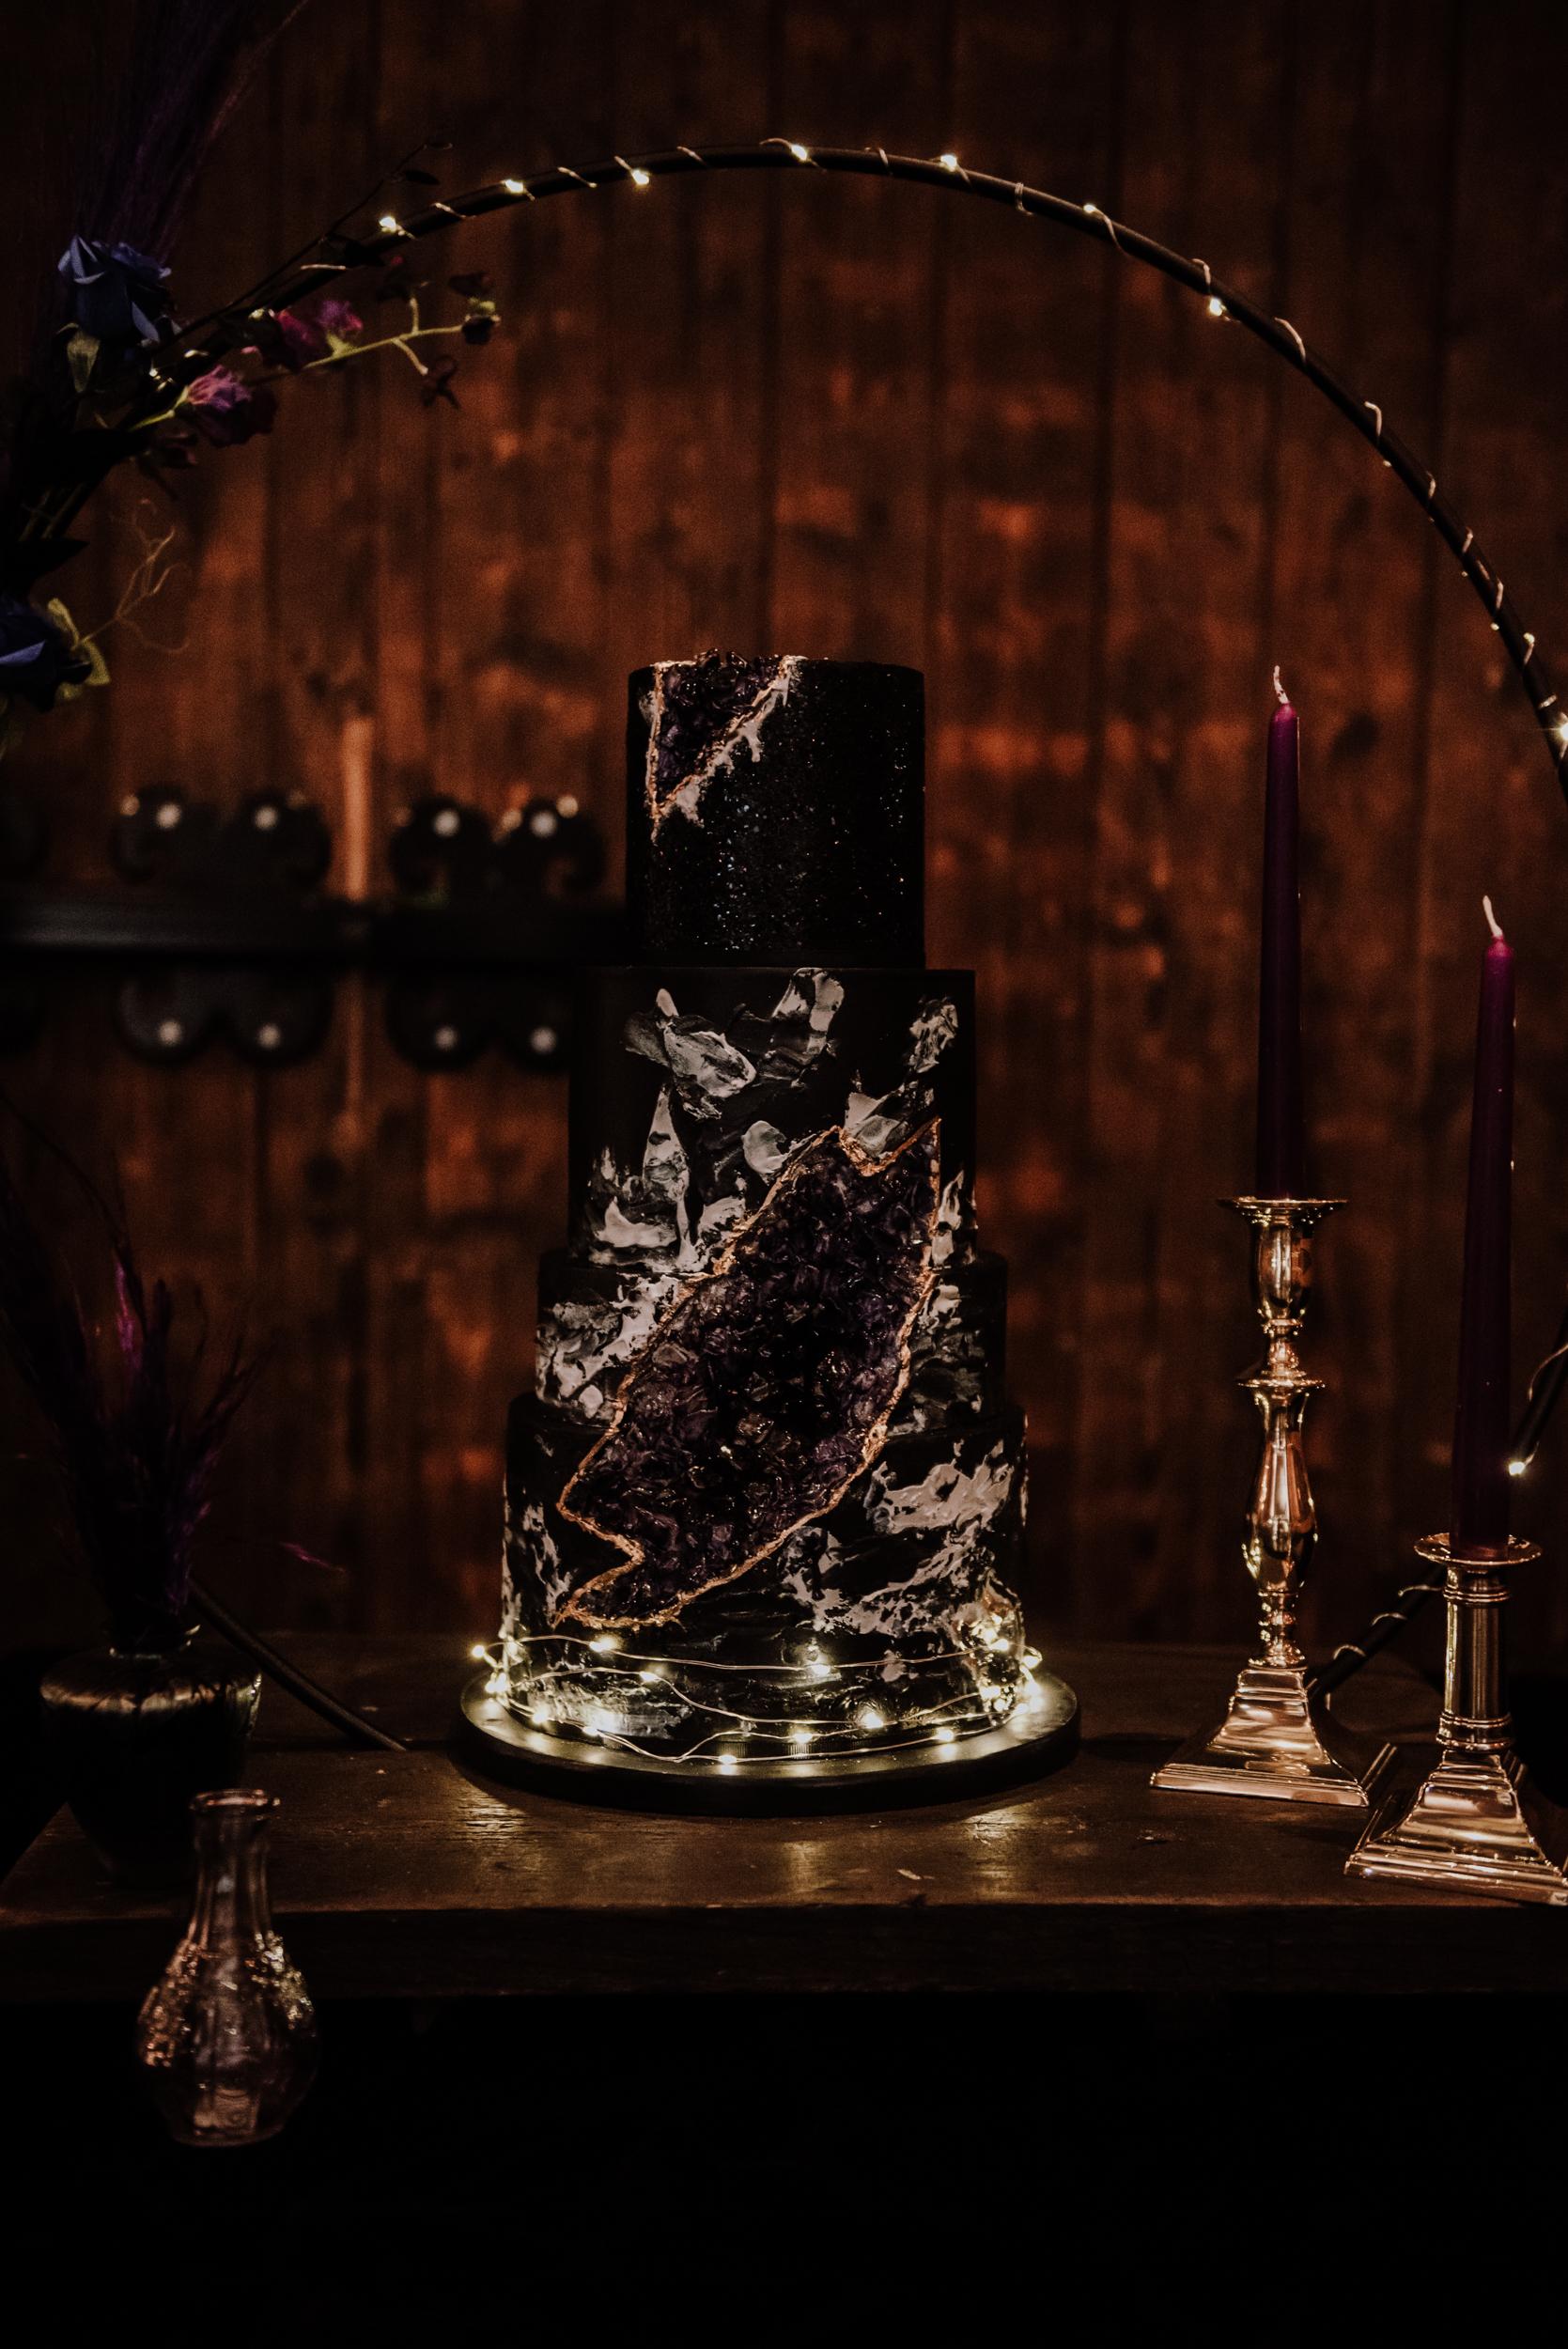 spectacular black wedding cake - crystal wedding cake - luxury wedding cake - galaxy wedding cake